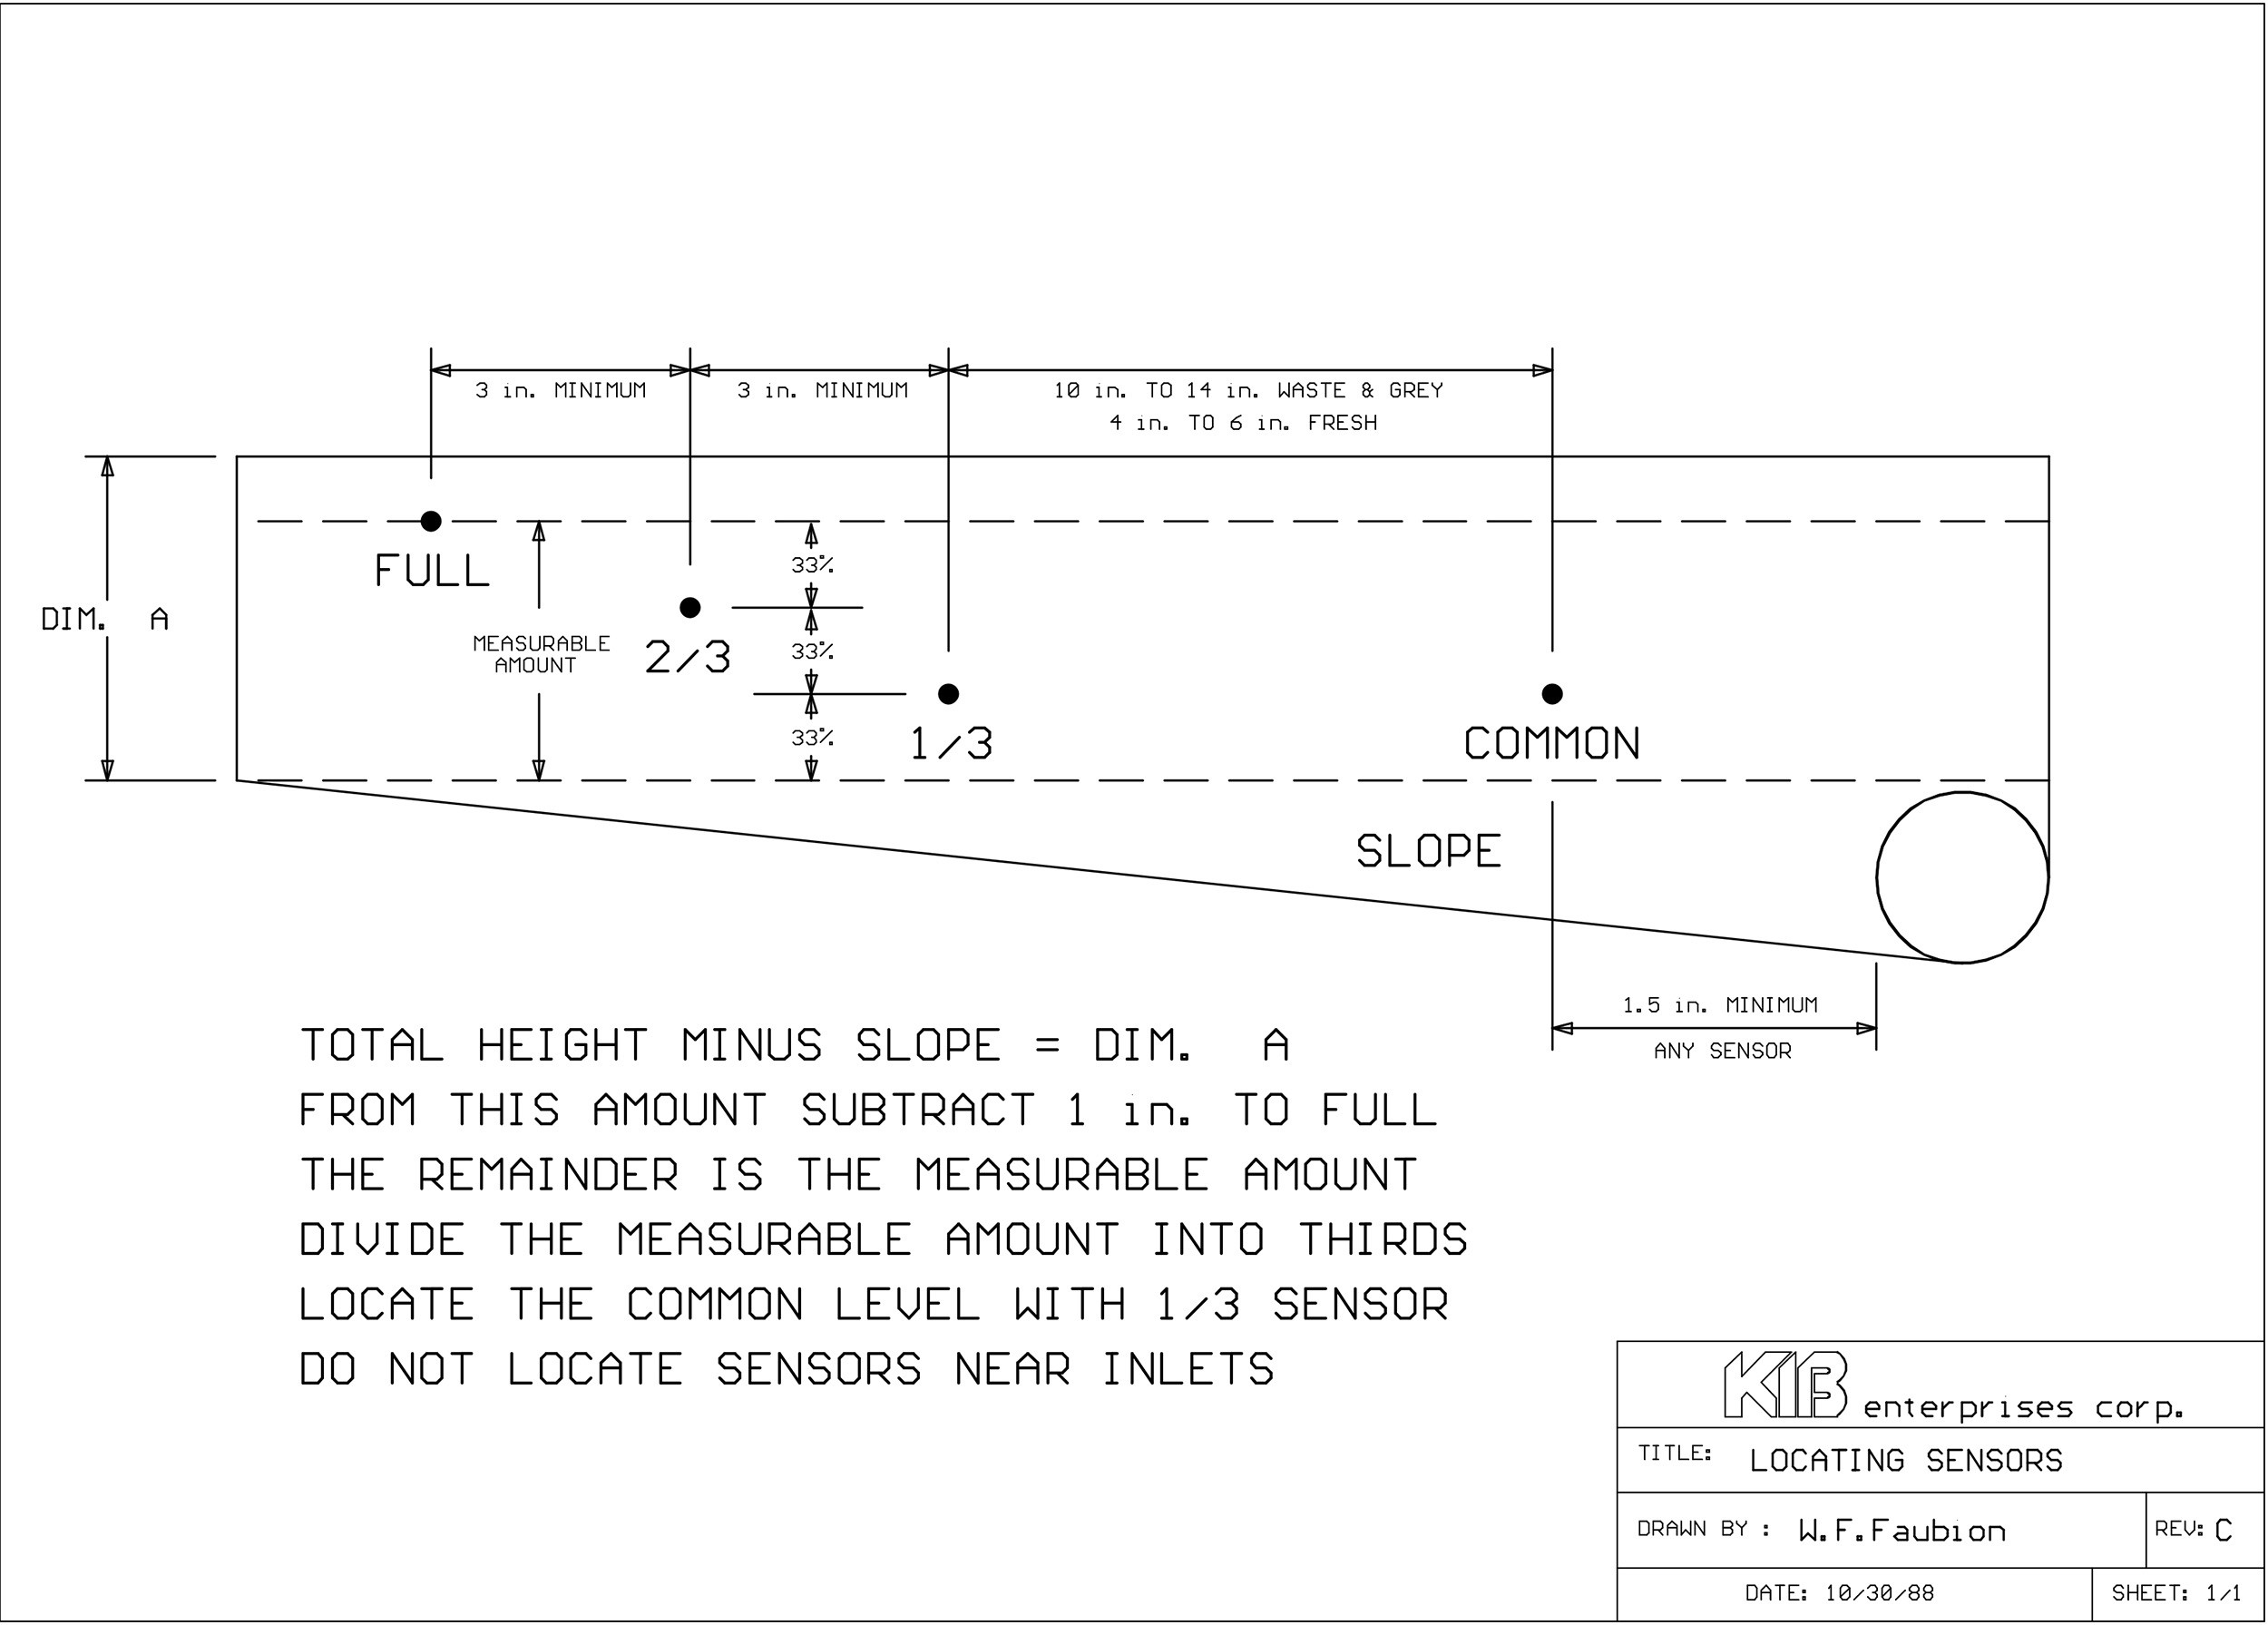 Kib Tank Monitor Instructions Vz 6646] Rv Holding Tank Sensor Wiring Free Diagram Of Kib Tank Monitor Instructions